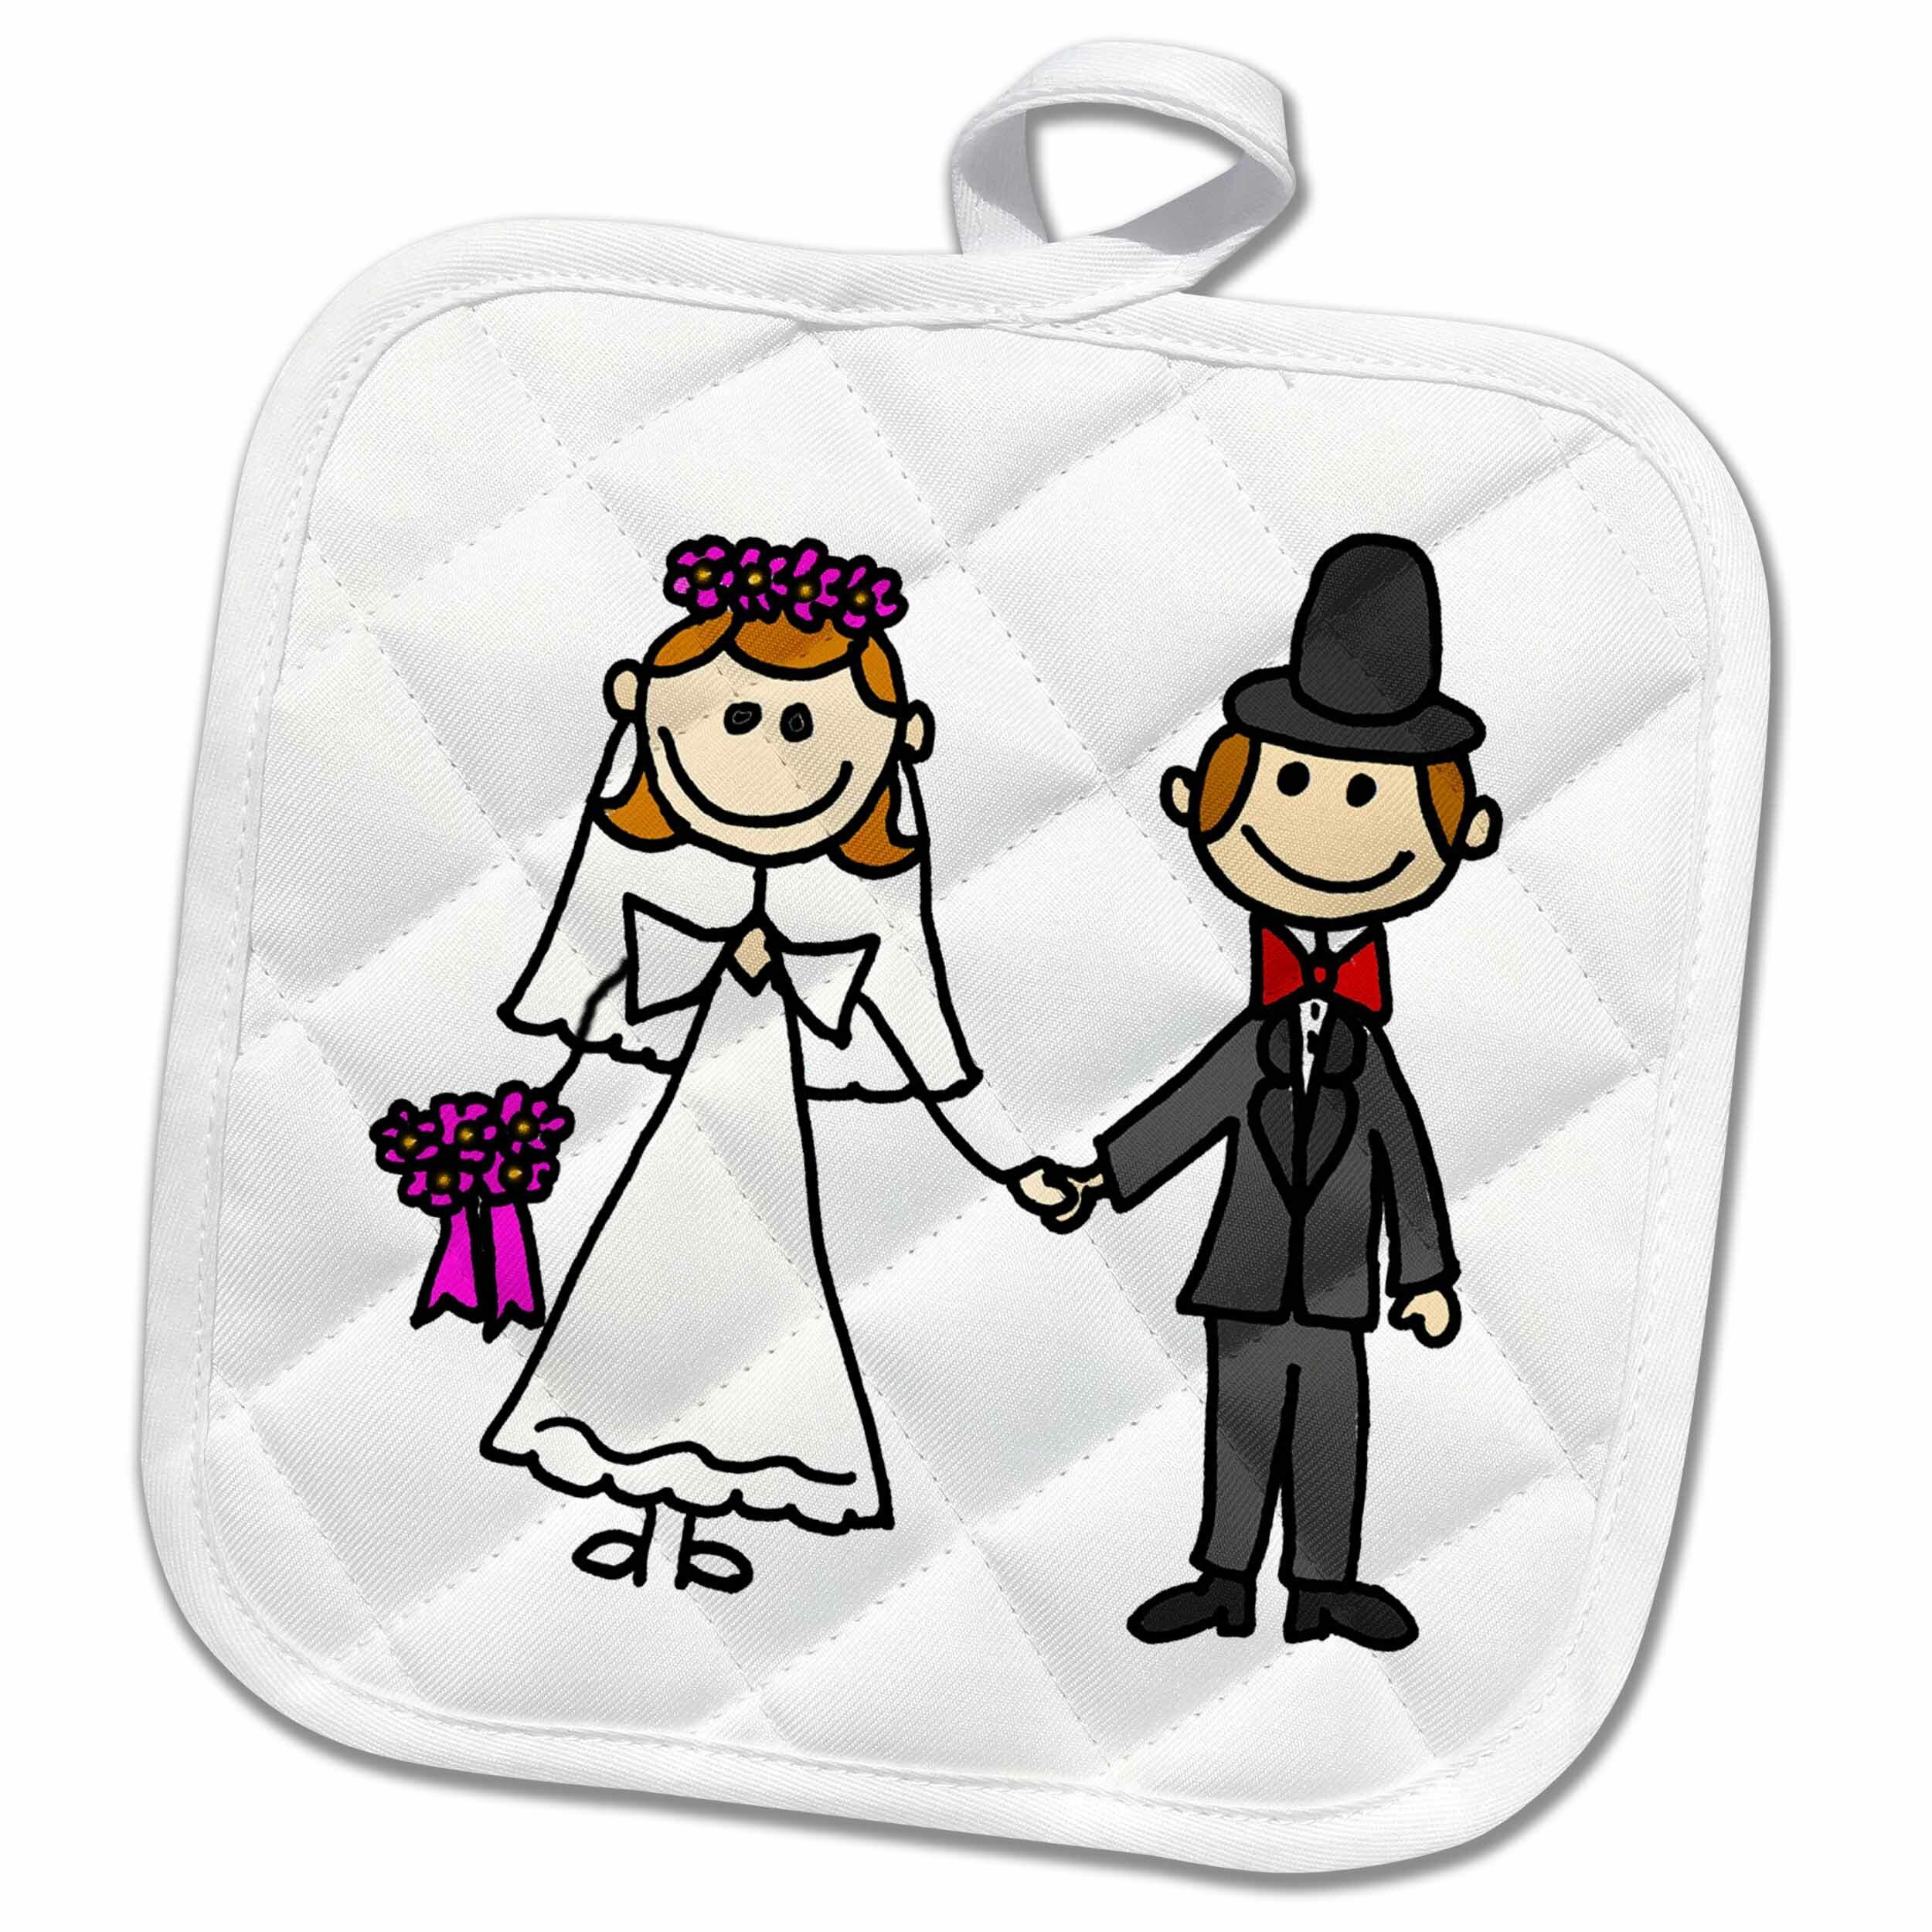 3drose Funny Stick Figure Wedding Bride And Groom Potholder Wayfair Ca